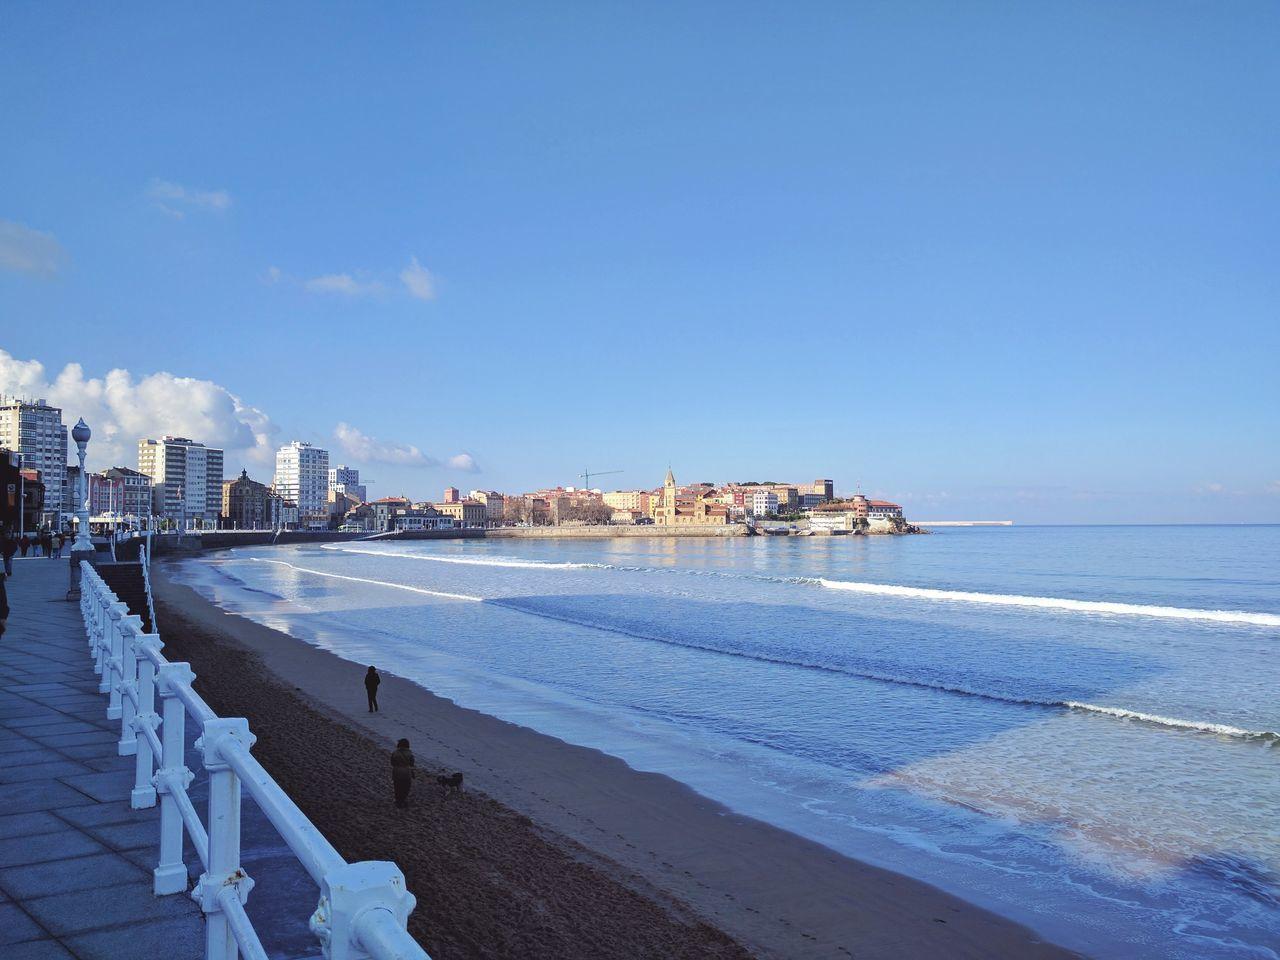 Gijón Beach Sea Outdoors Sky City Water Urban Skyline No People Skyscraper Architecture Day — Taken with Nexus 6P